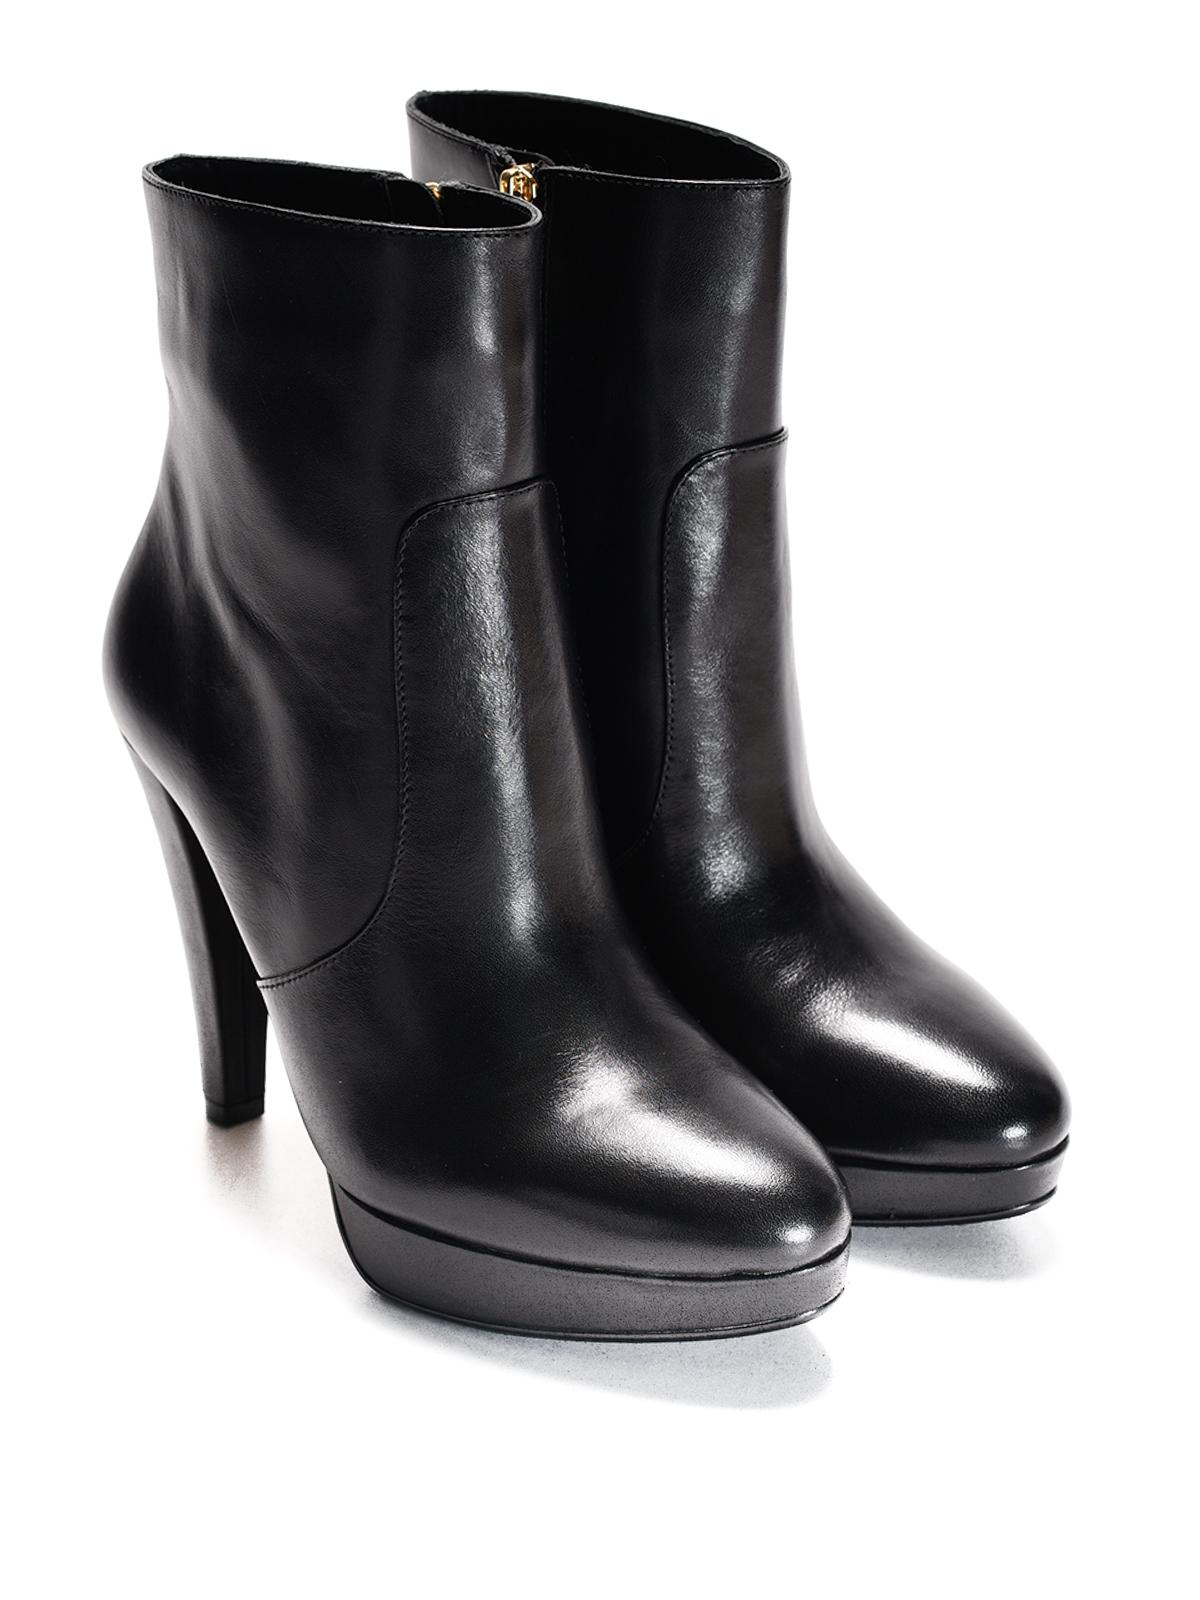 michael kors georgia platform ankle boots ankle boots. Black Bedroom Furniture Sets. Home Design Ideas